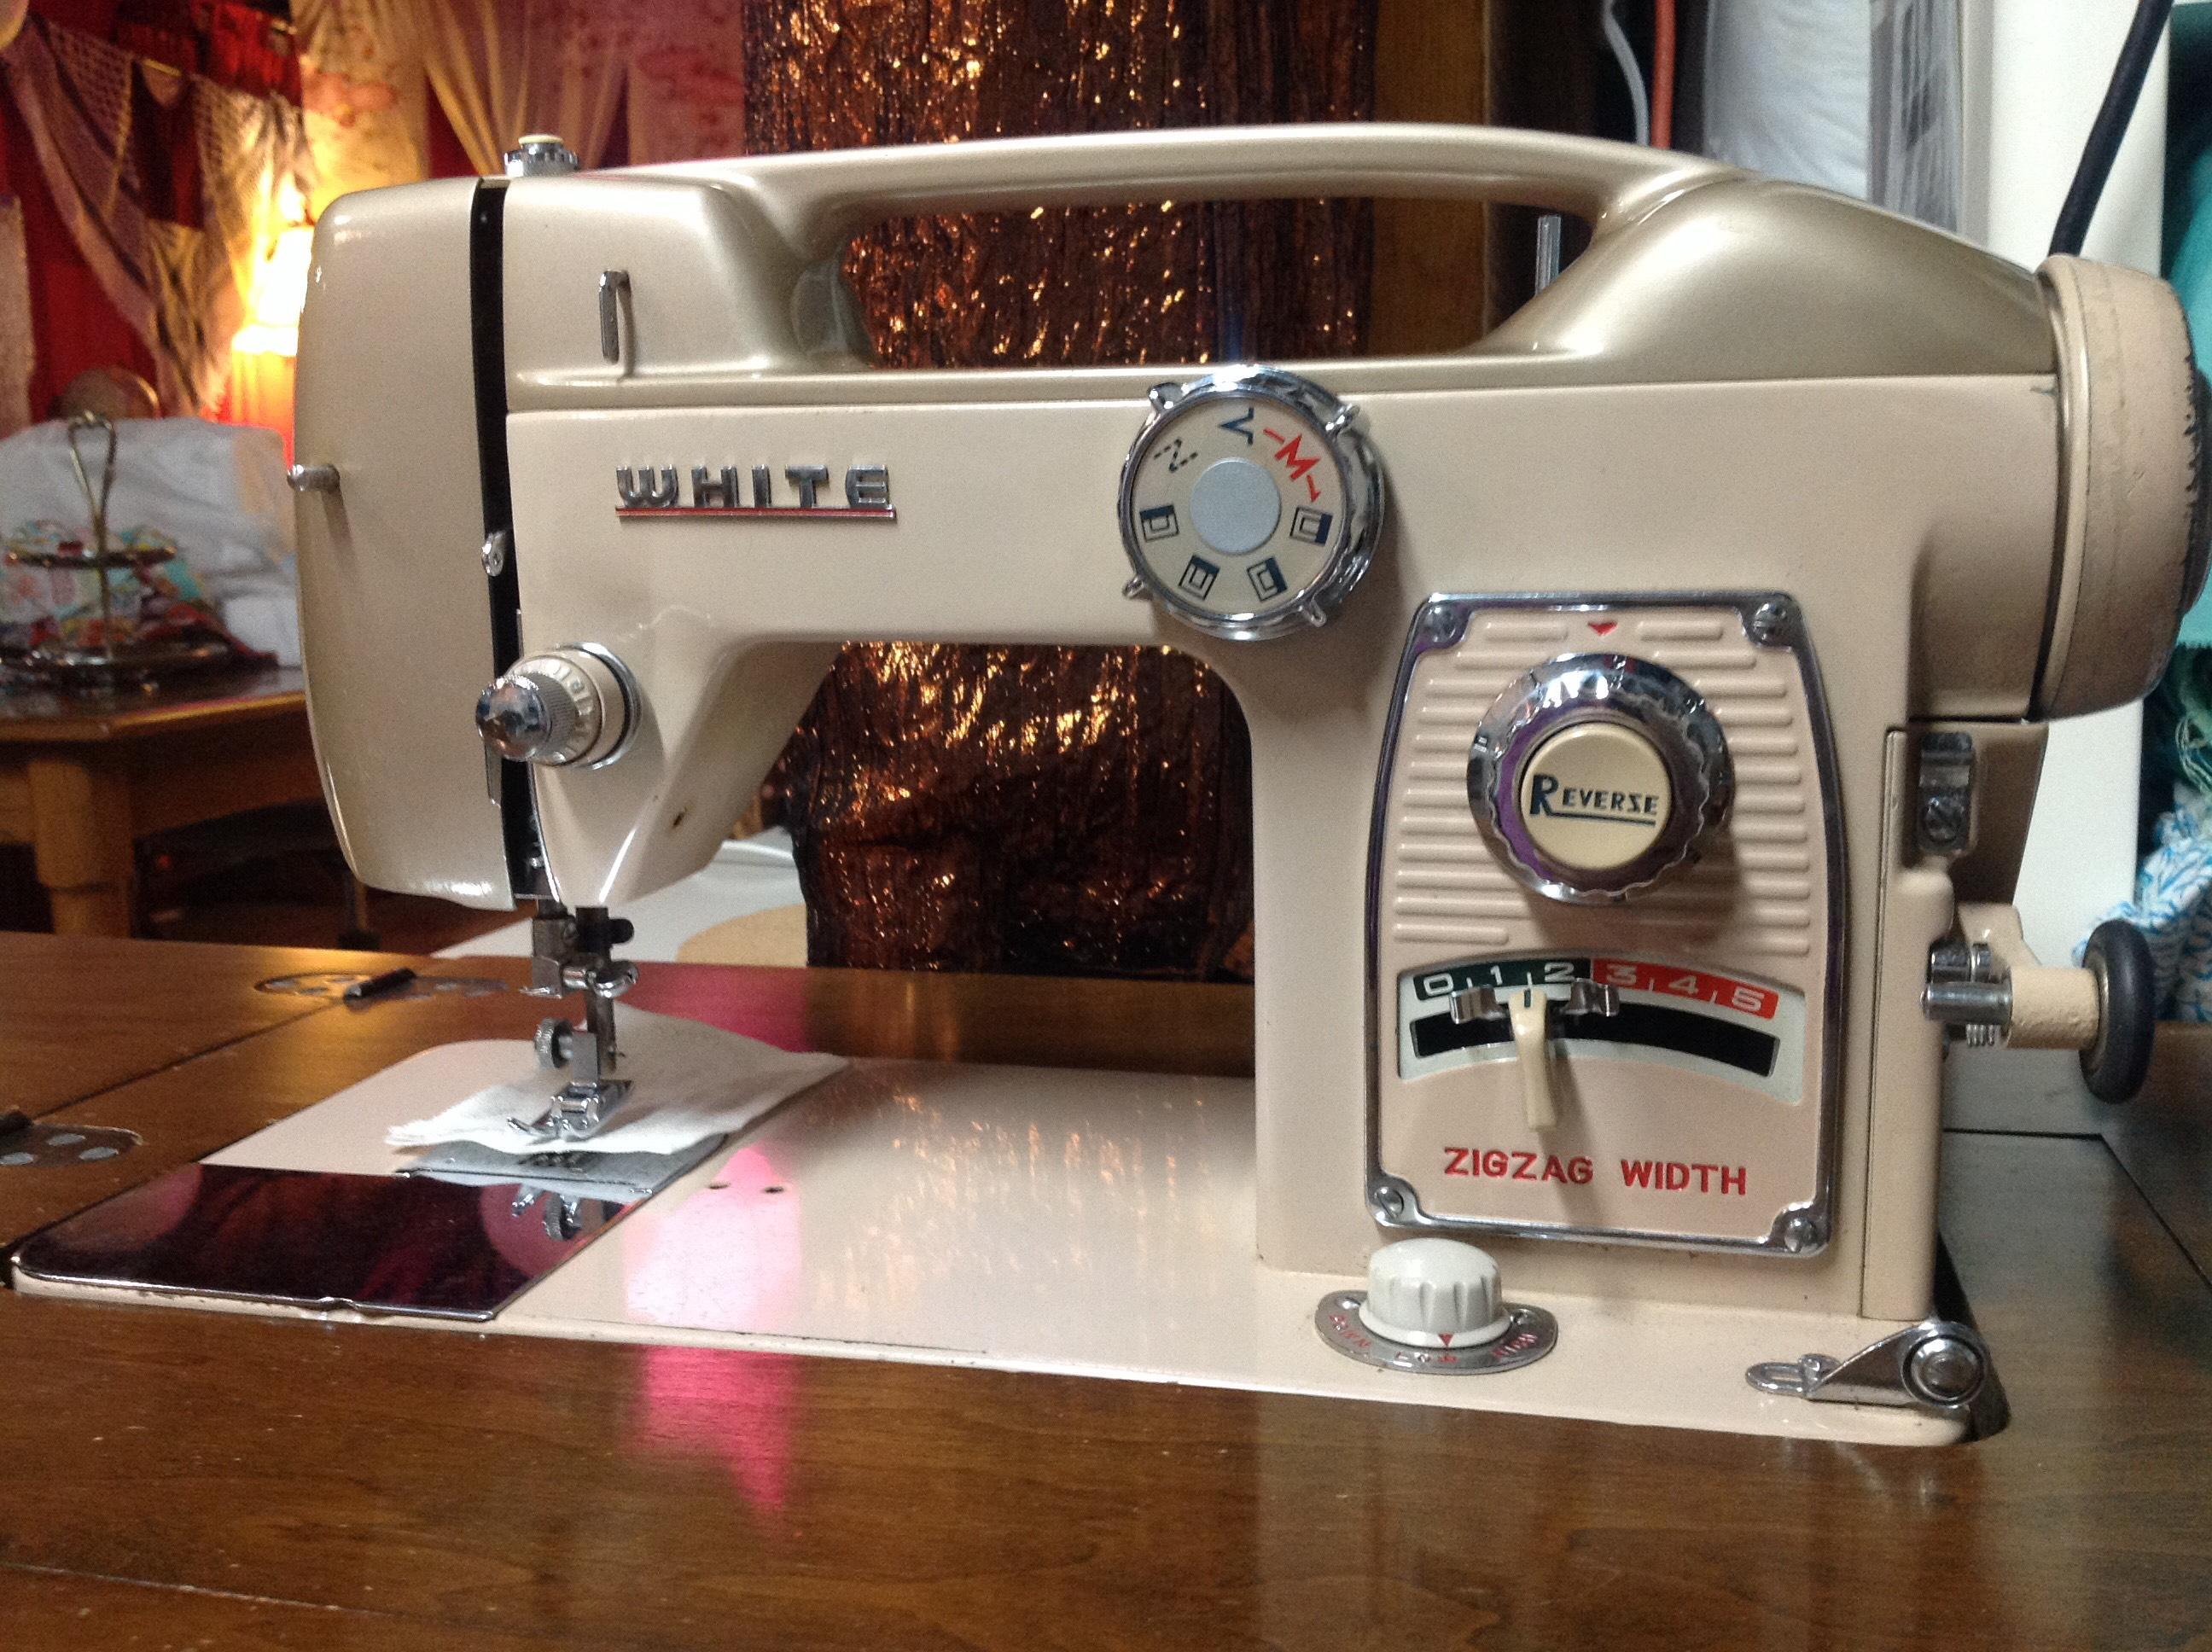 bobbin banga a love for artful design and precision machinery donna mejia